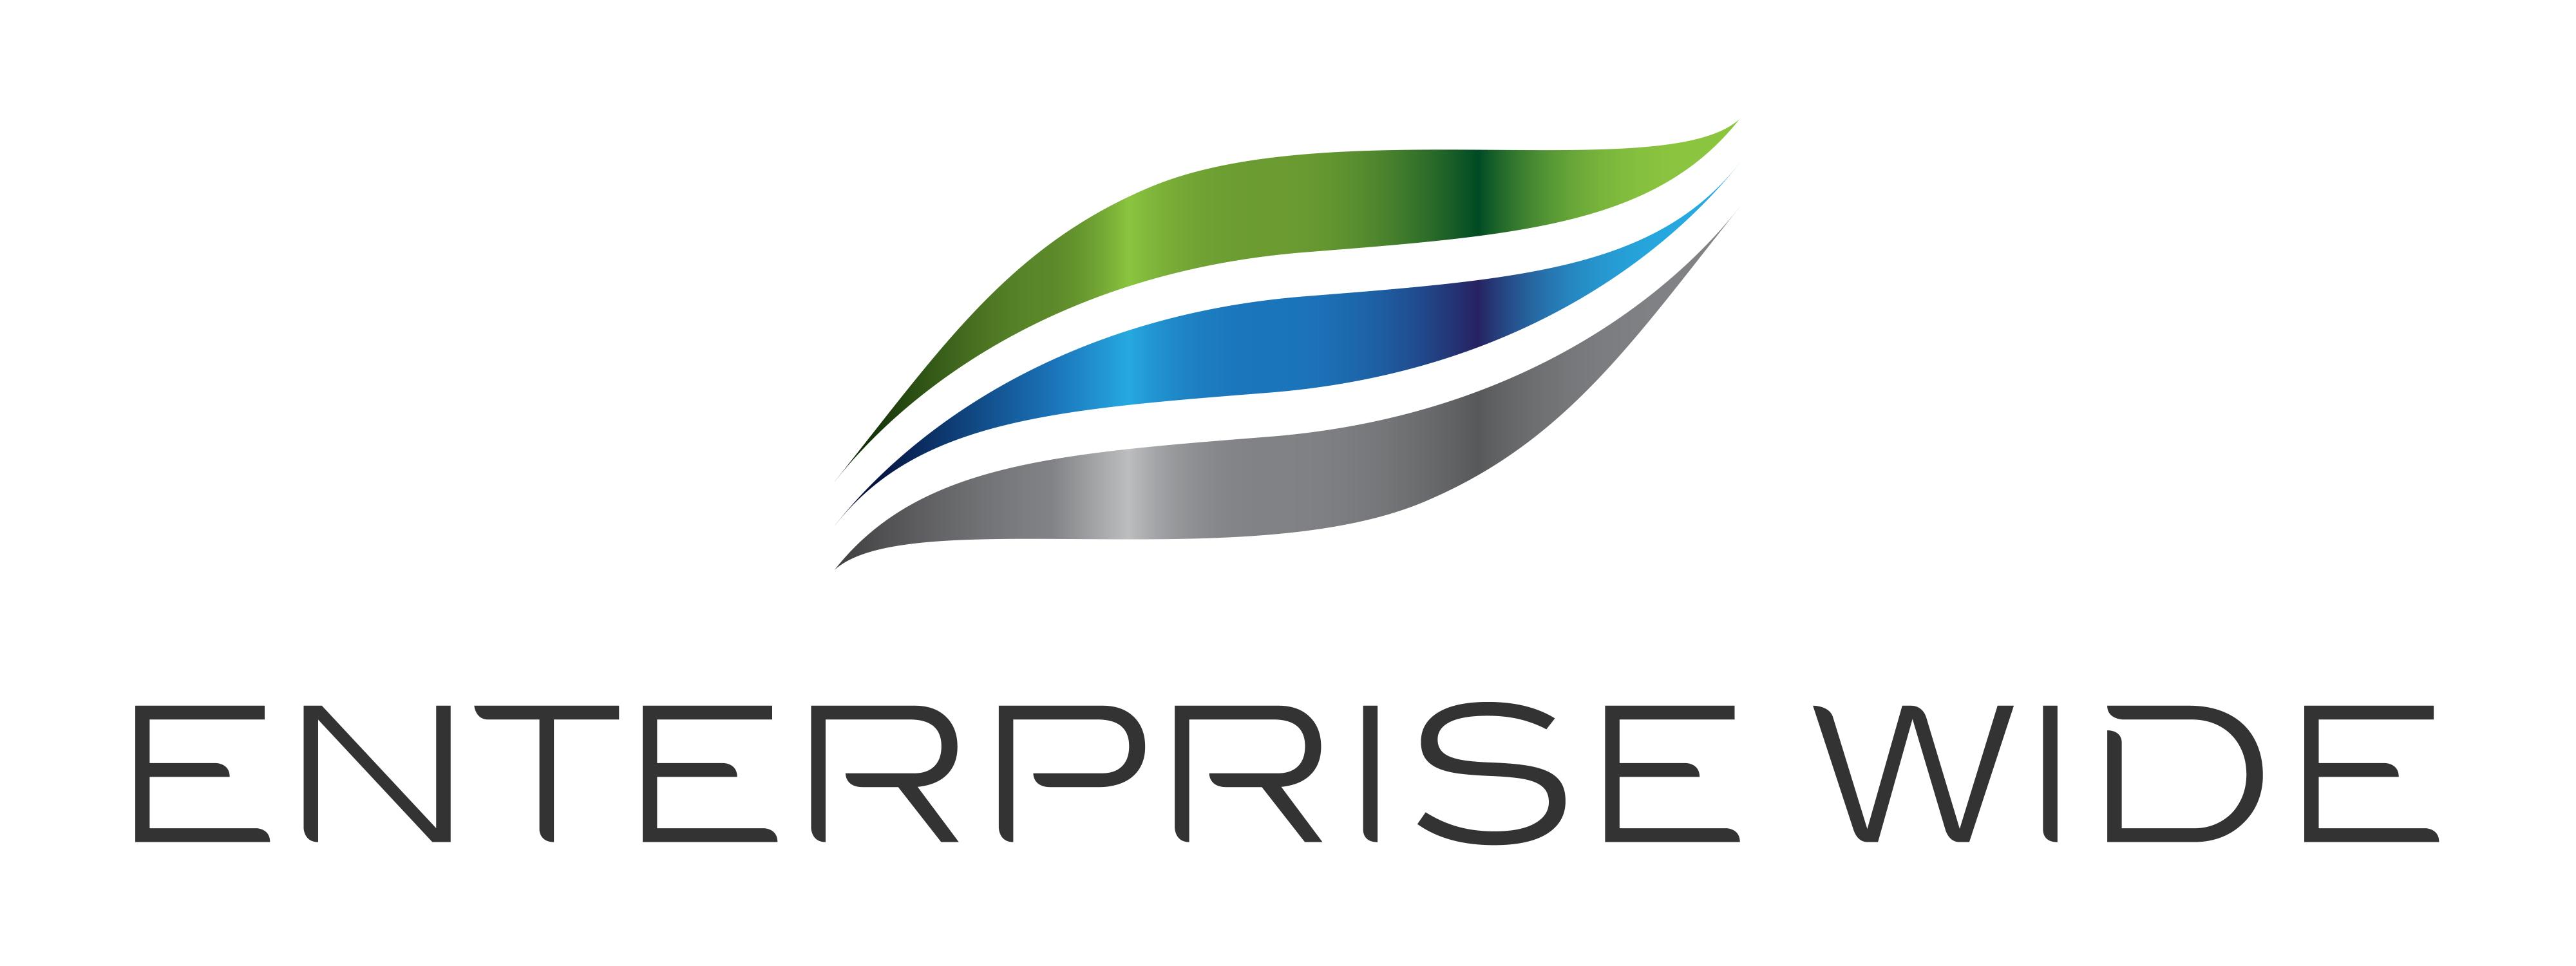 Enterprise Wide, a chatbot developer